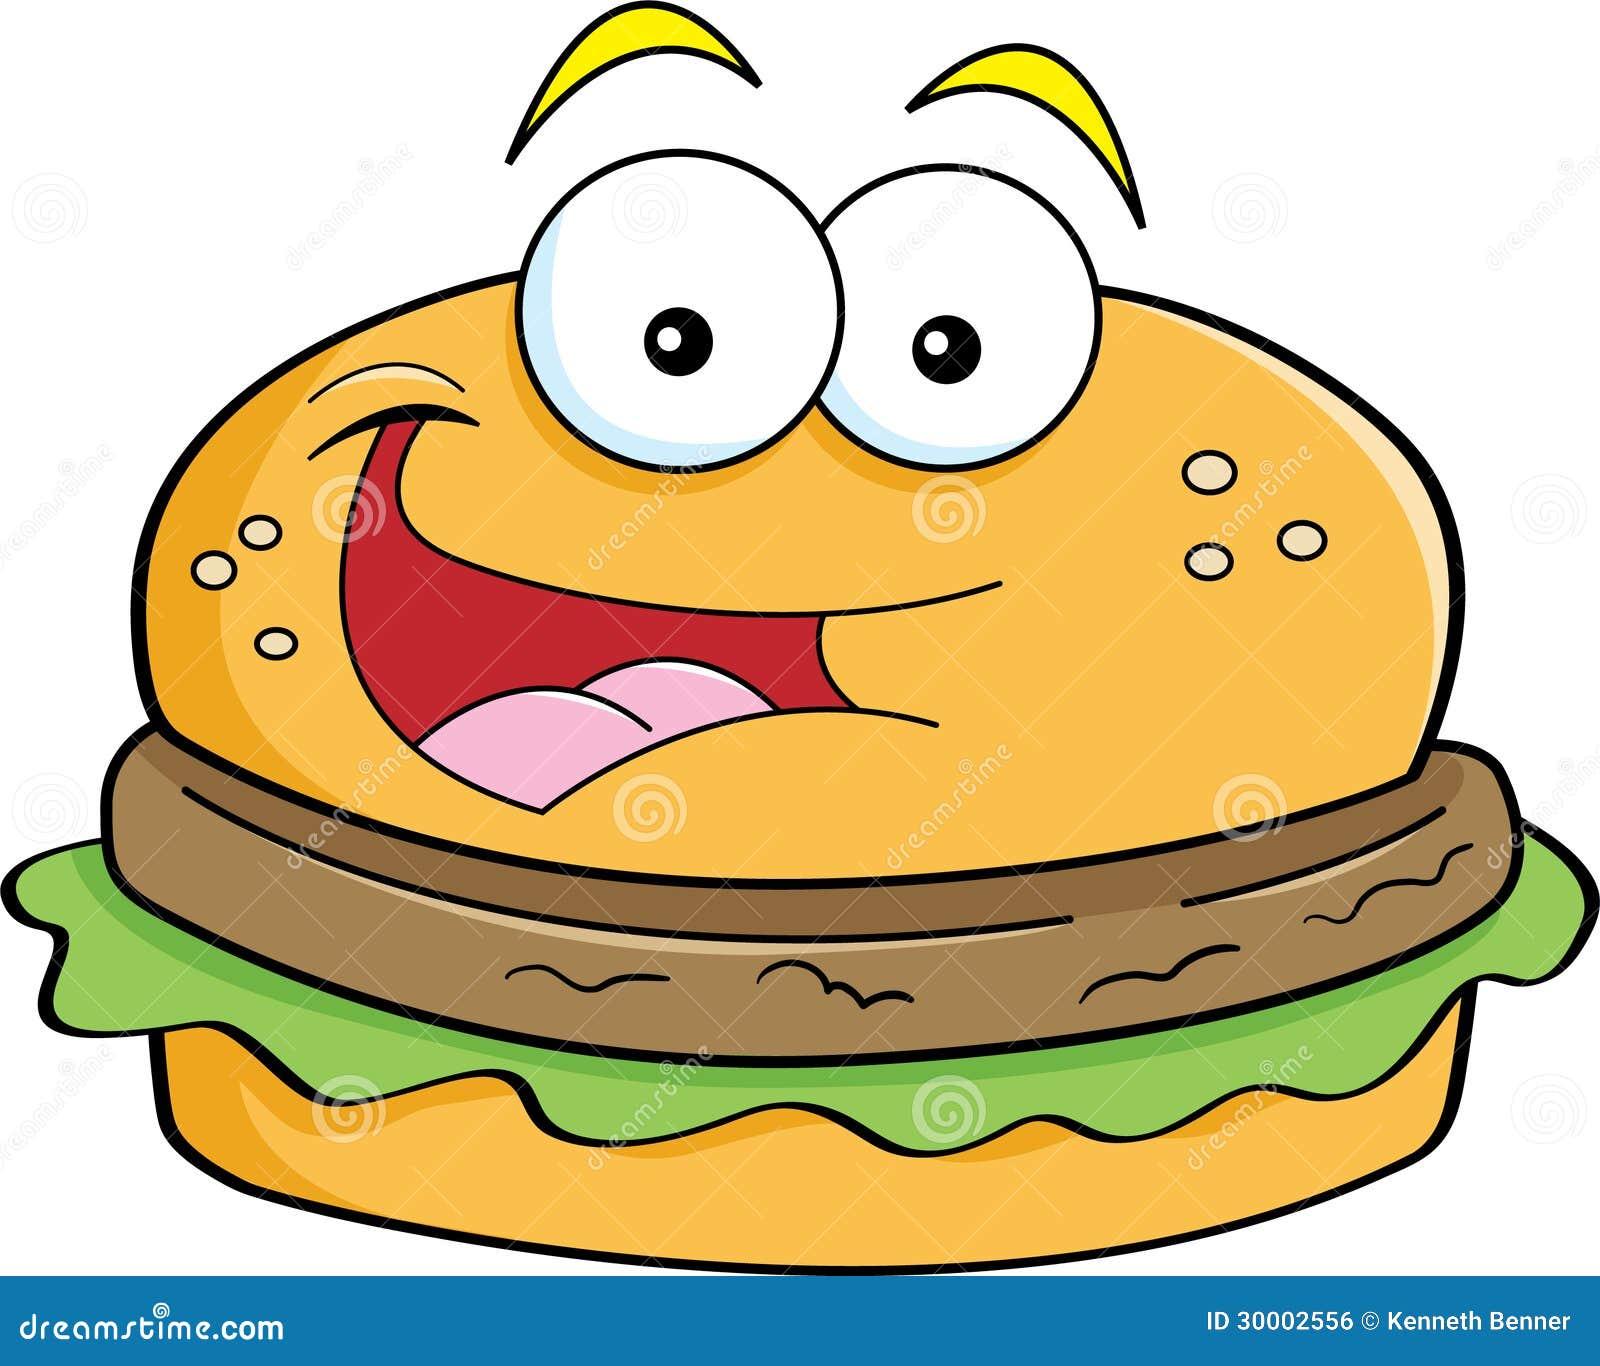 Cartoon Hamburger Royalty Free Stock Image - Image: 30002556